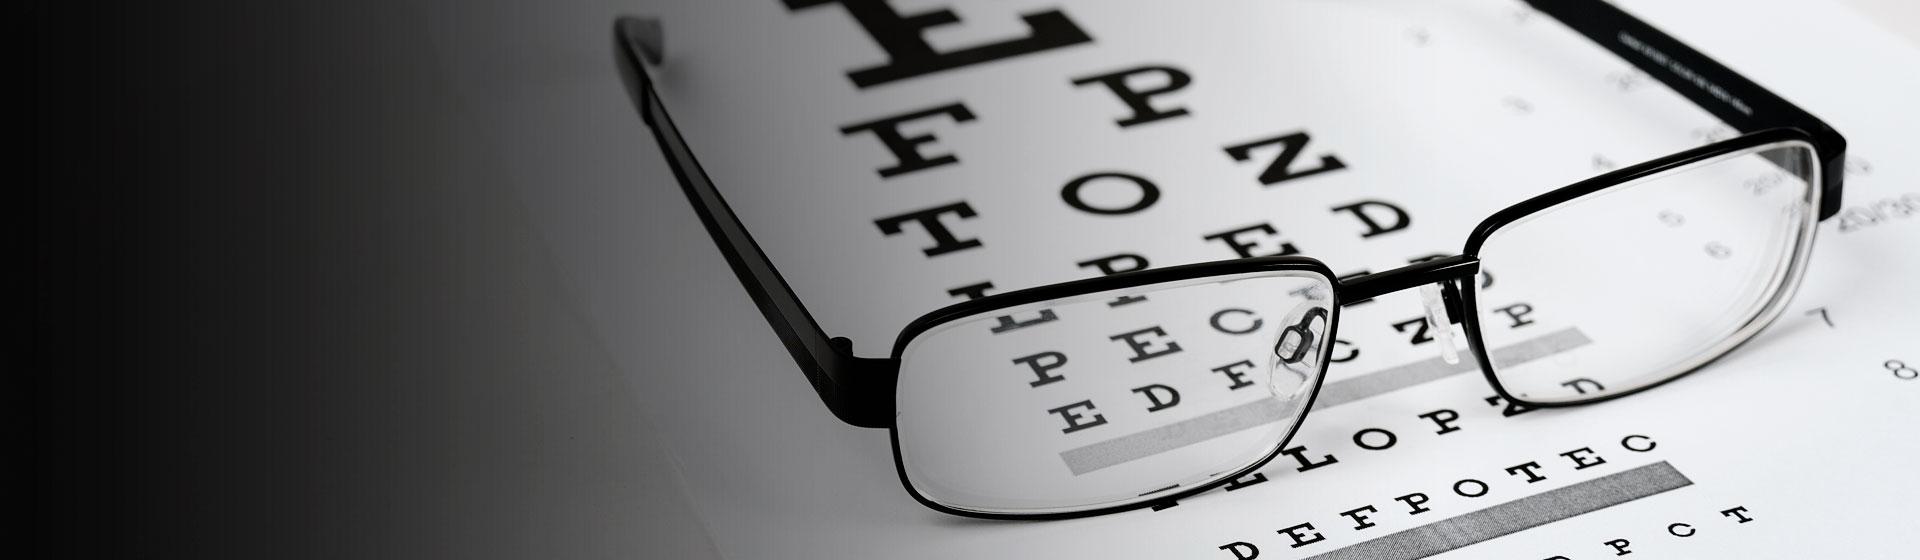 vision_testing_top_1920x560